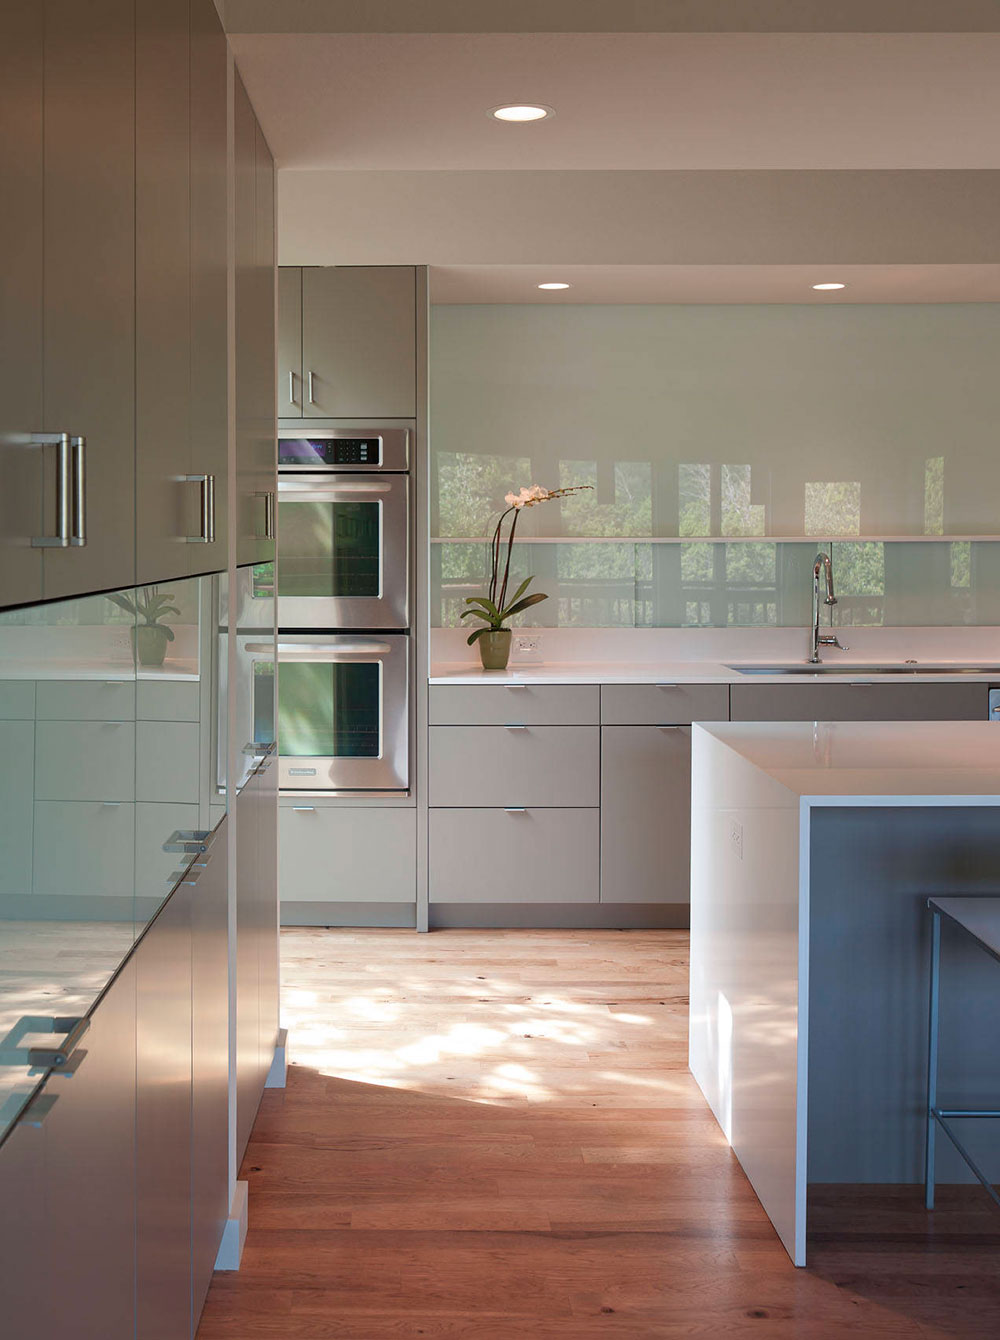 Foxtree Cove Webber Studio Architects Moderna interiördesignstilar